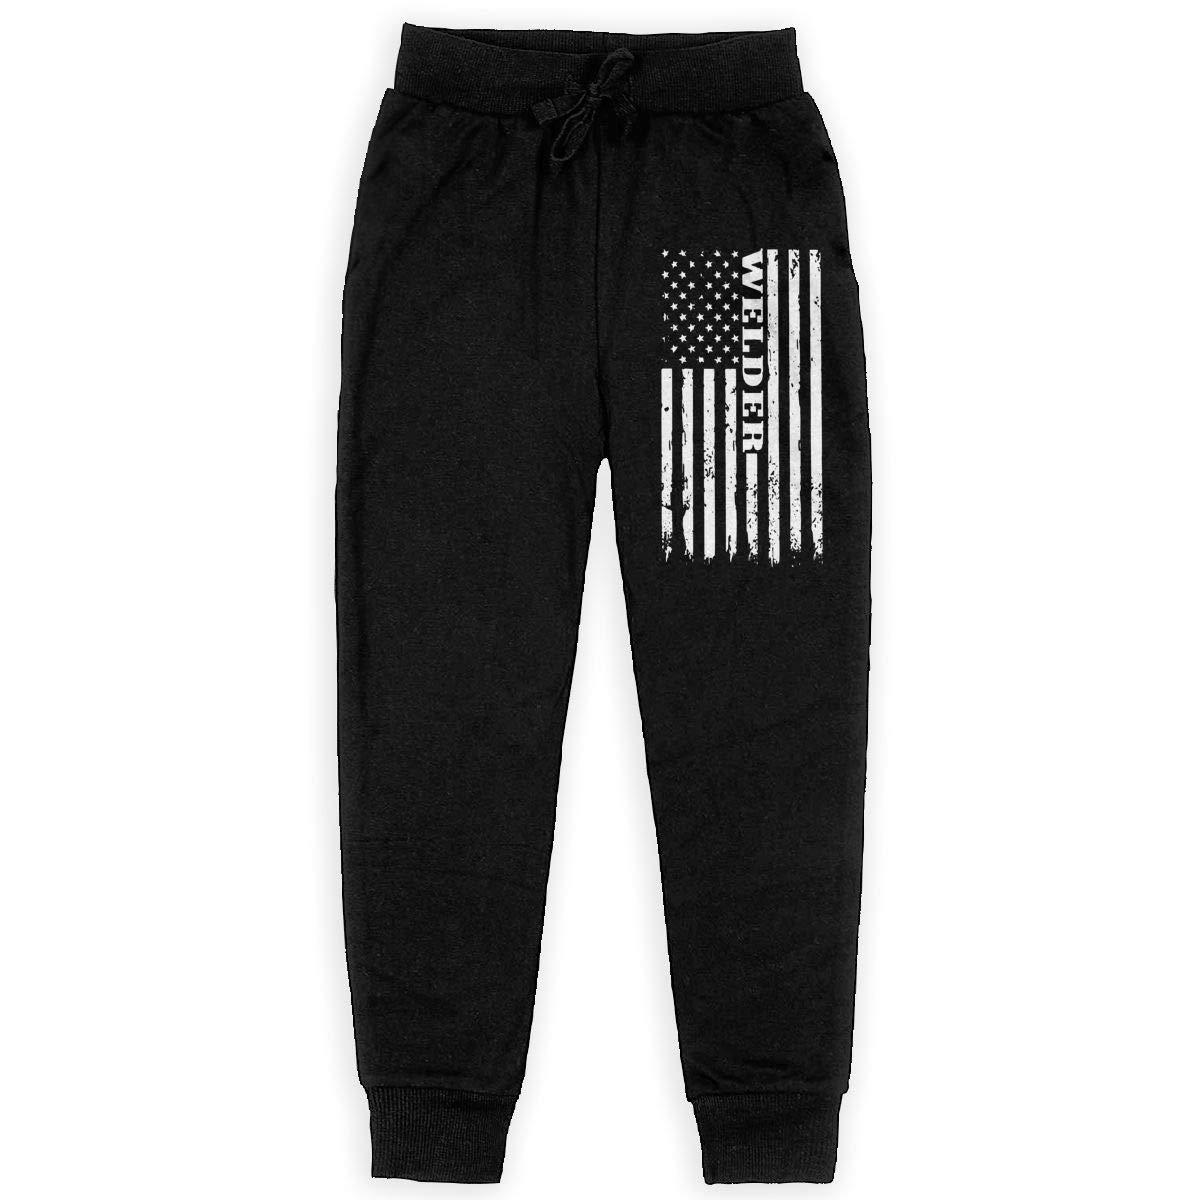 MAOYI/&J6 American Welder Proud Welding Long Sweatpants Teens Boys Girls Jogger Pants with Pockets